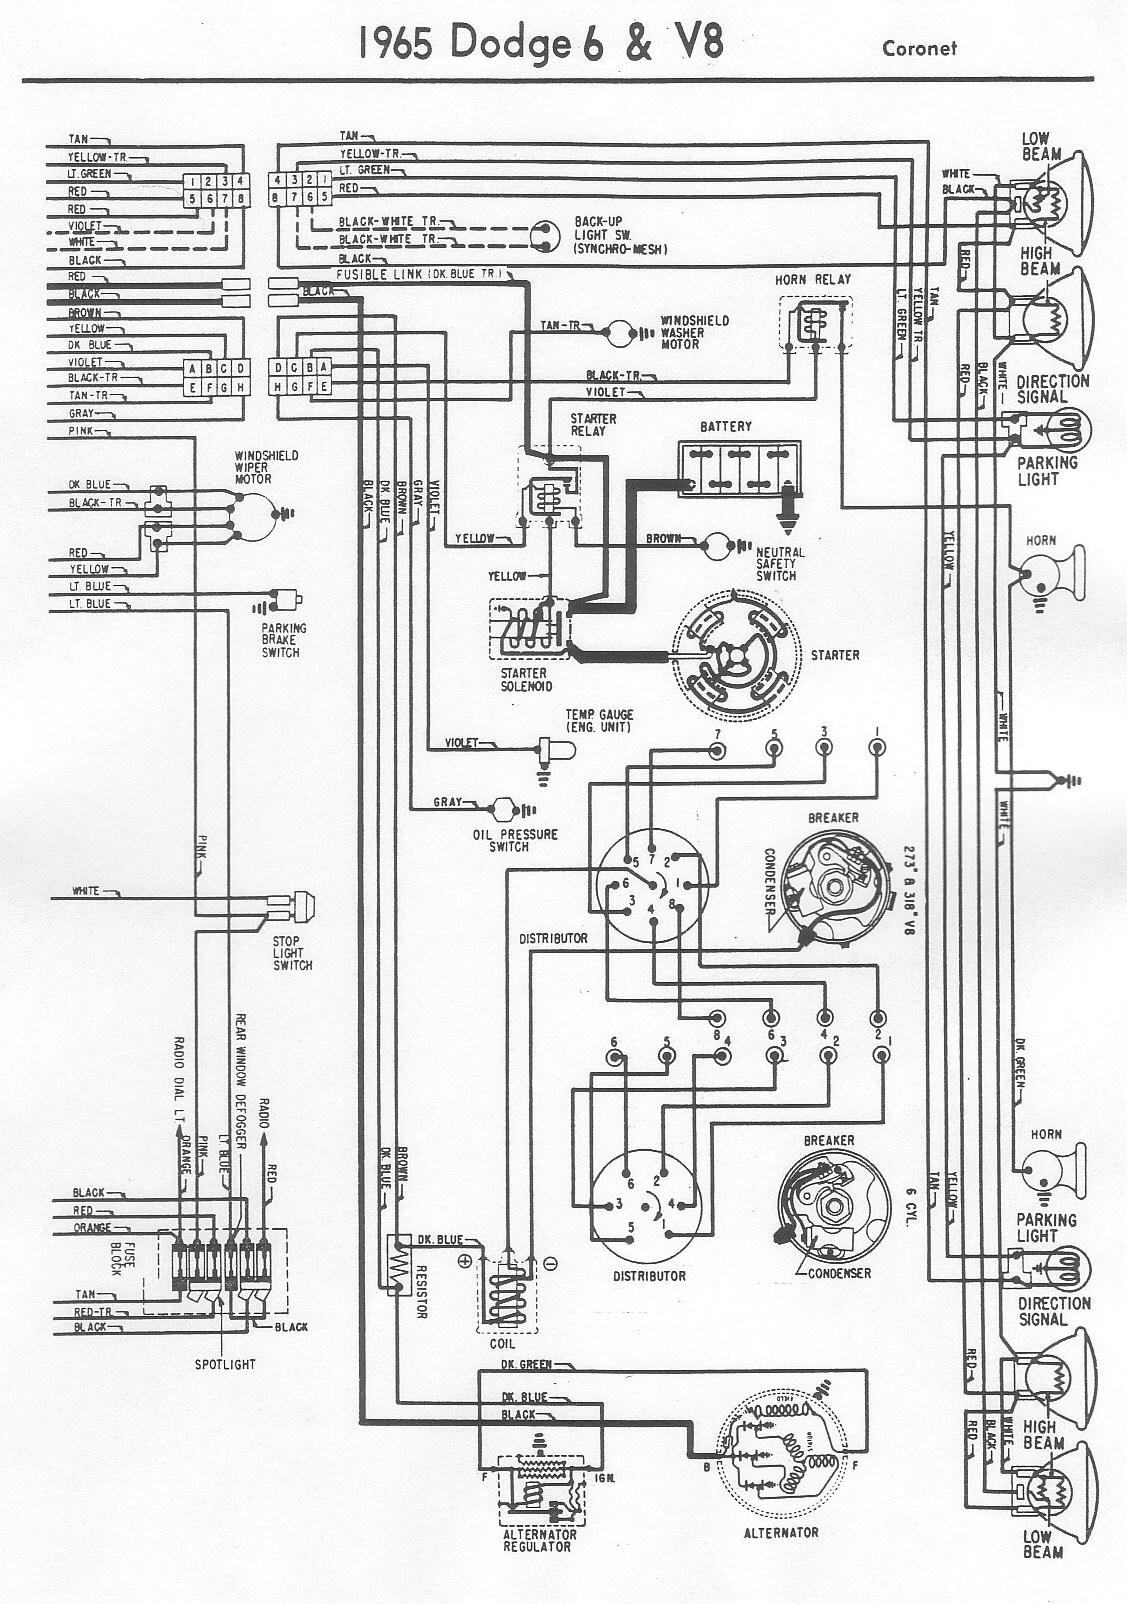 Wiring 392 Diagrams Mopar P05150869D | Wiring Diagram - Mopar Wiring Diagram